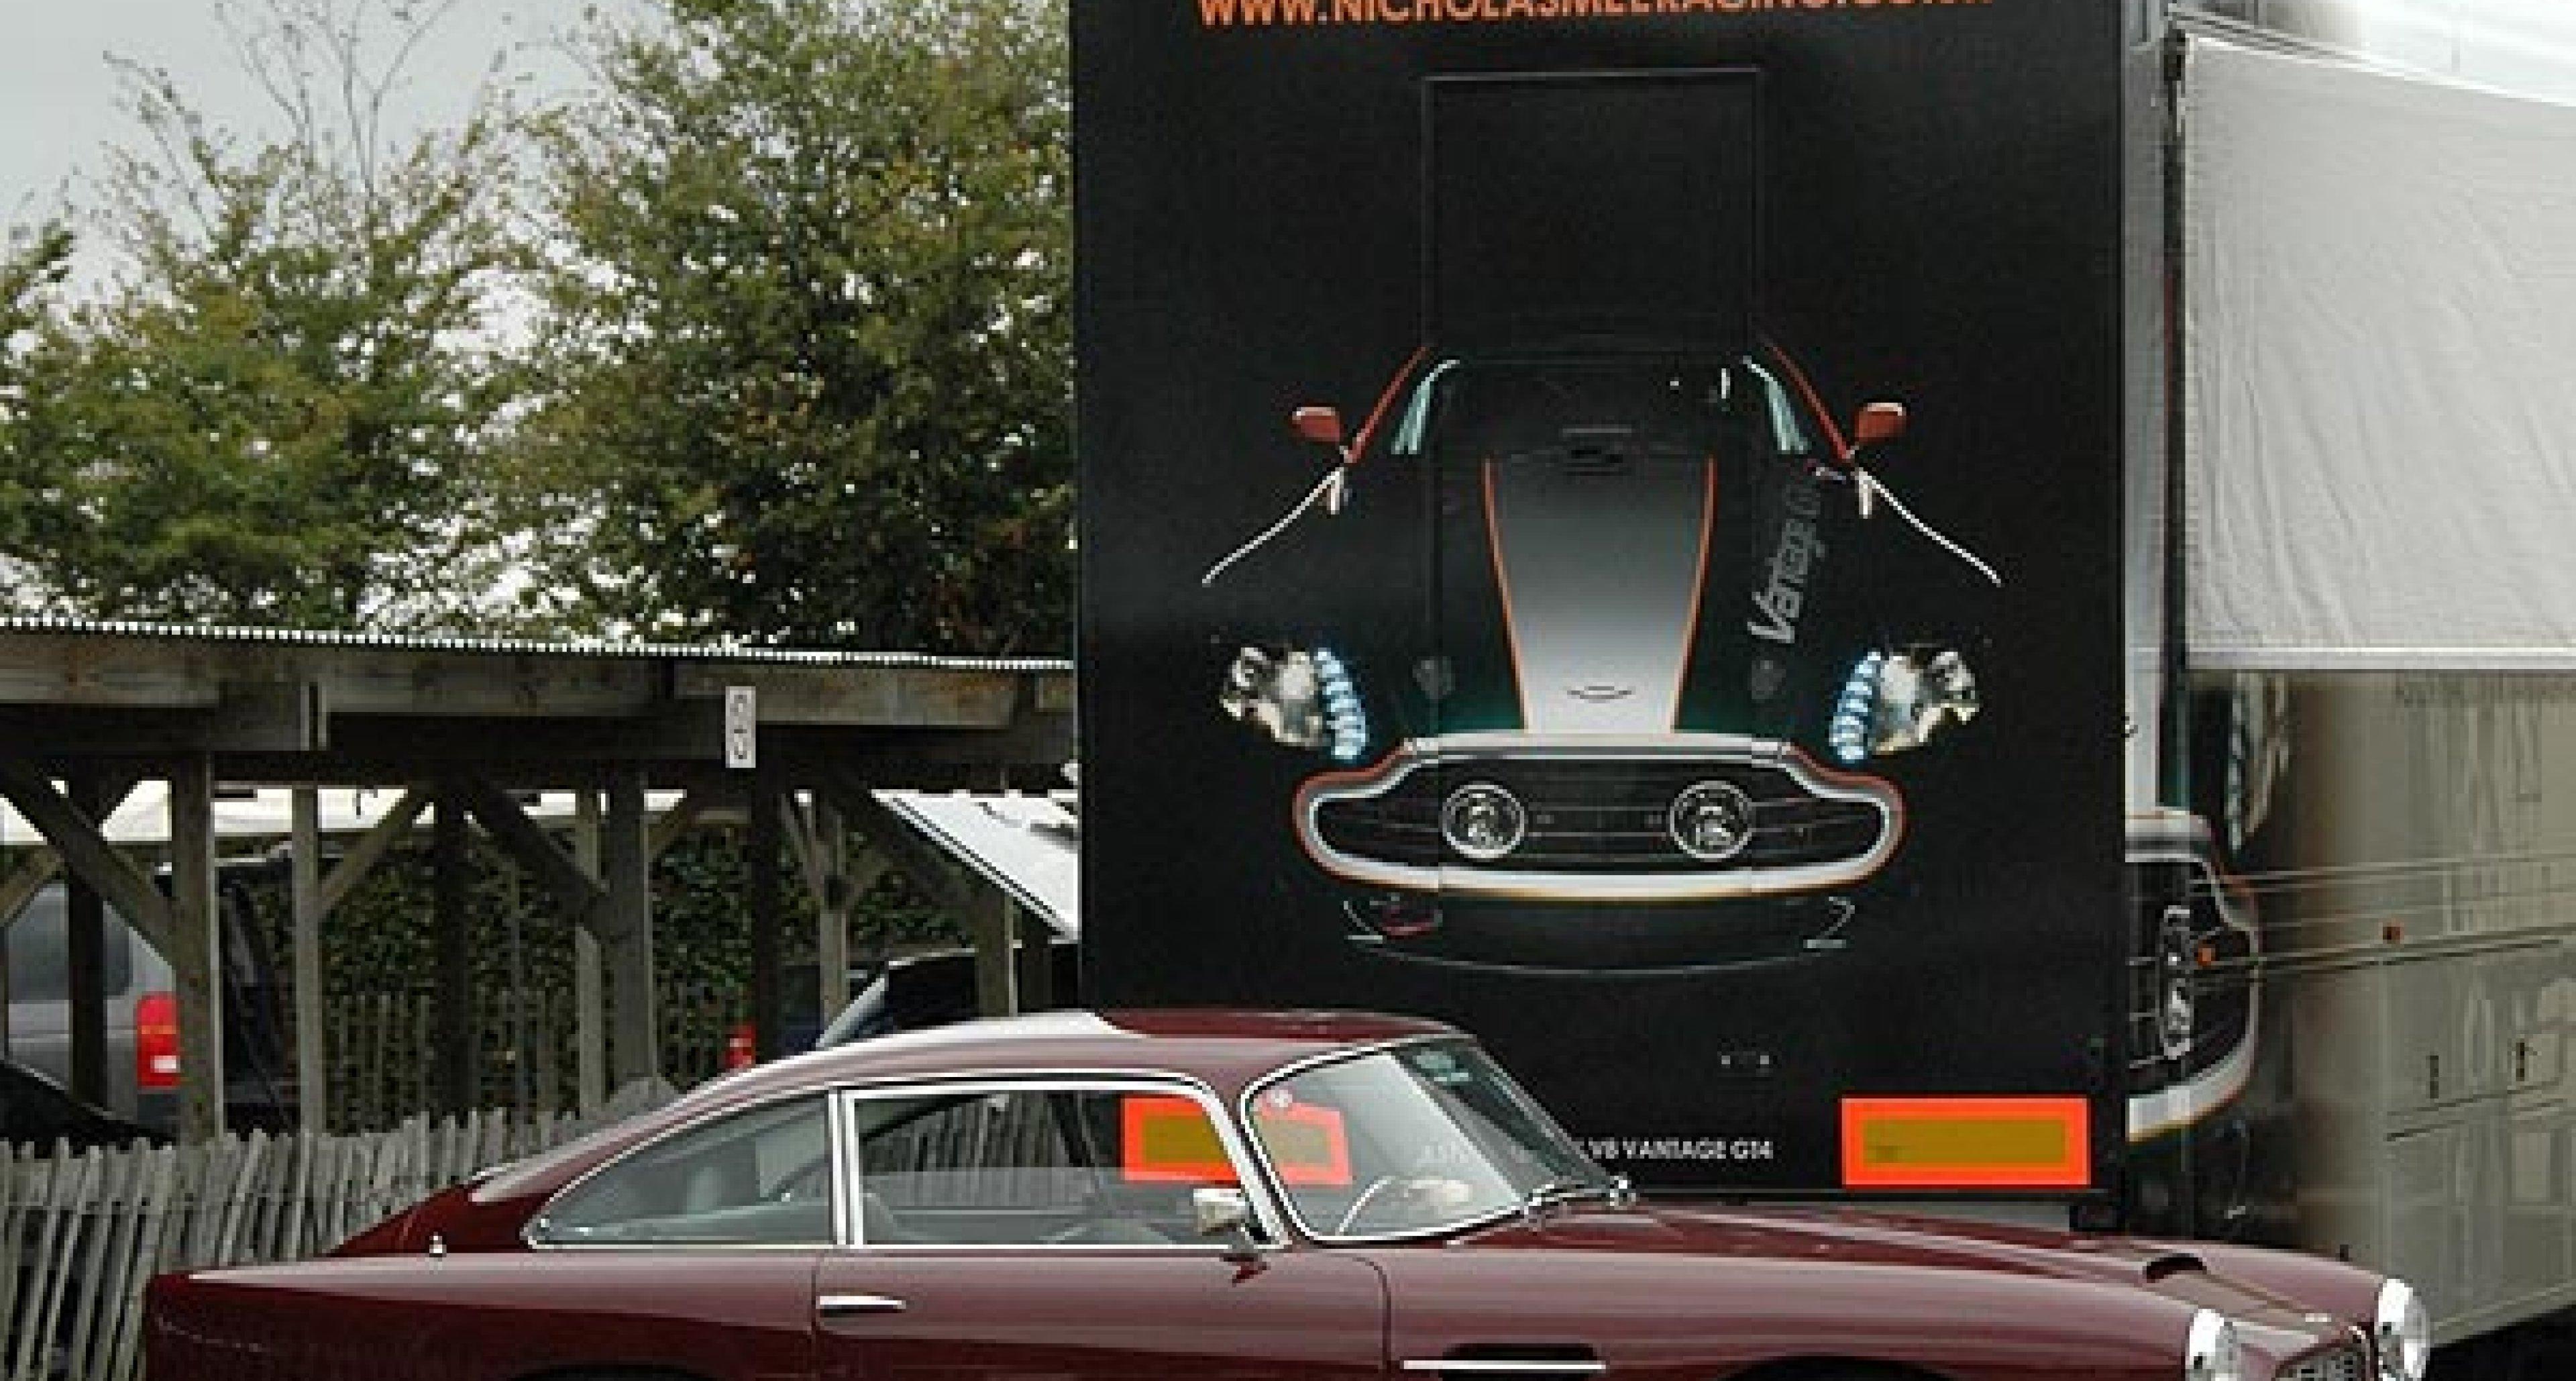 Track Test: Aston Martin V8 Vantage GT4